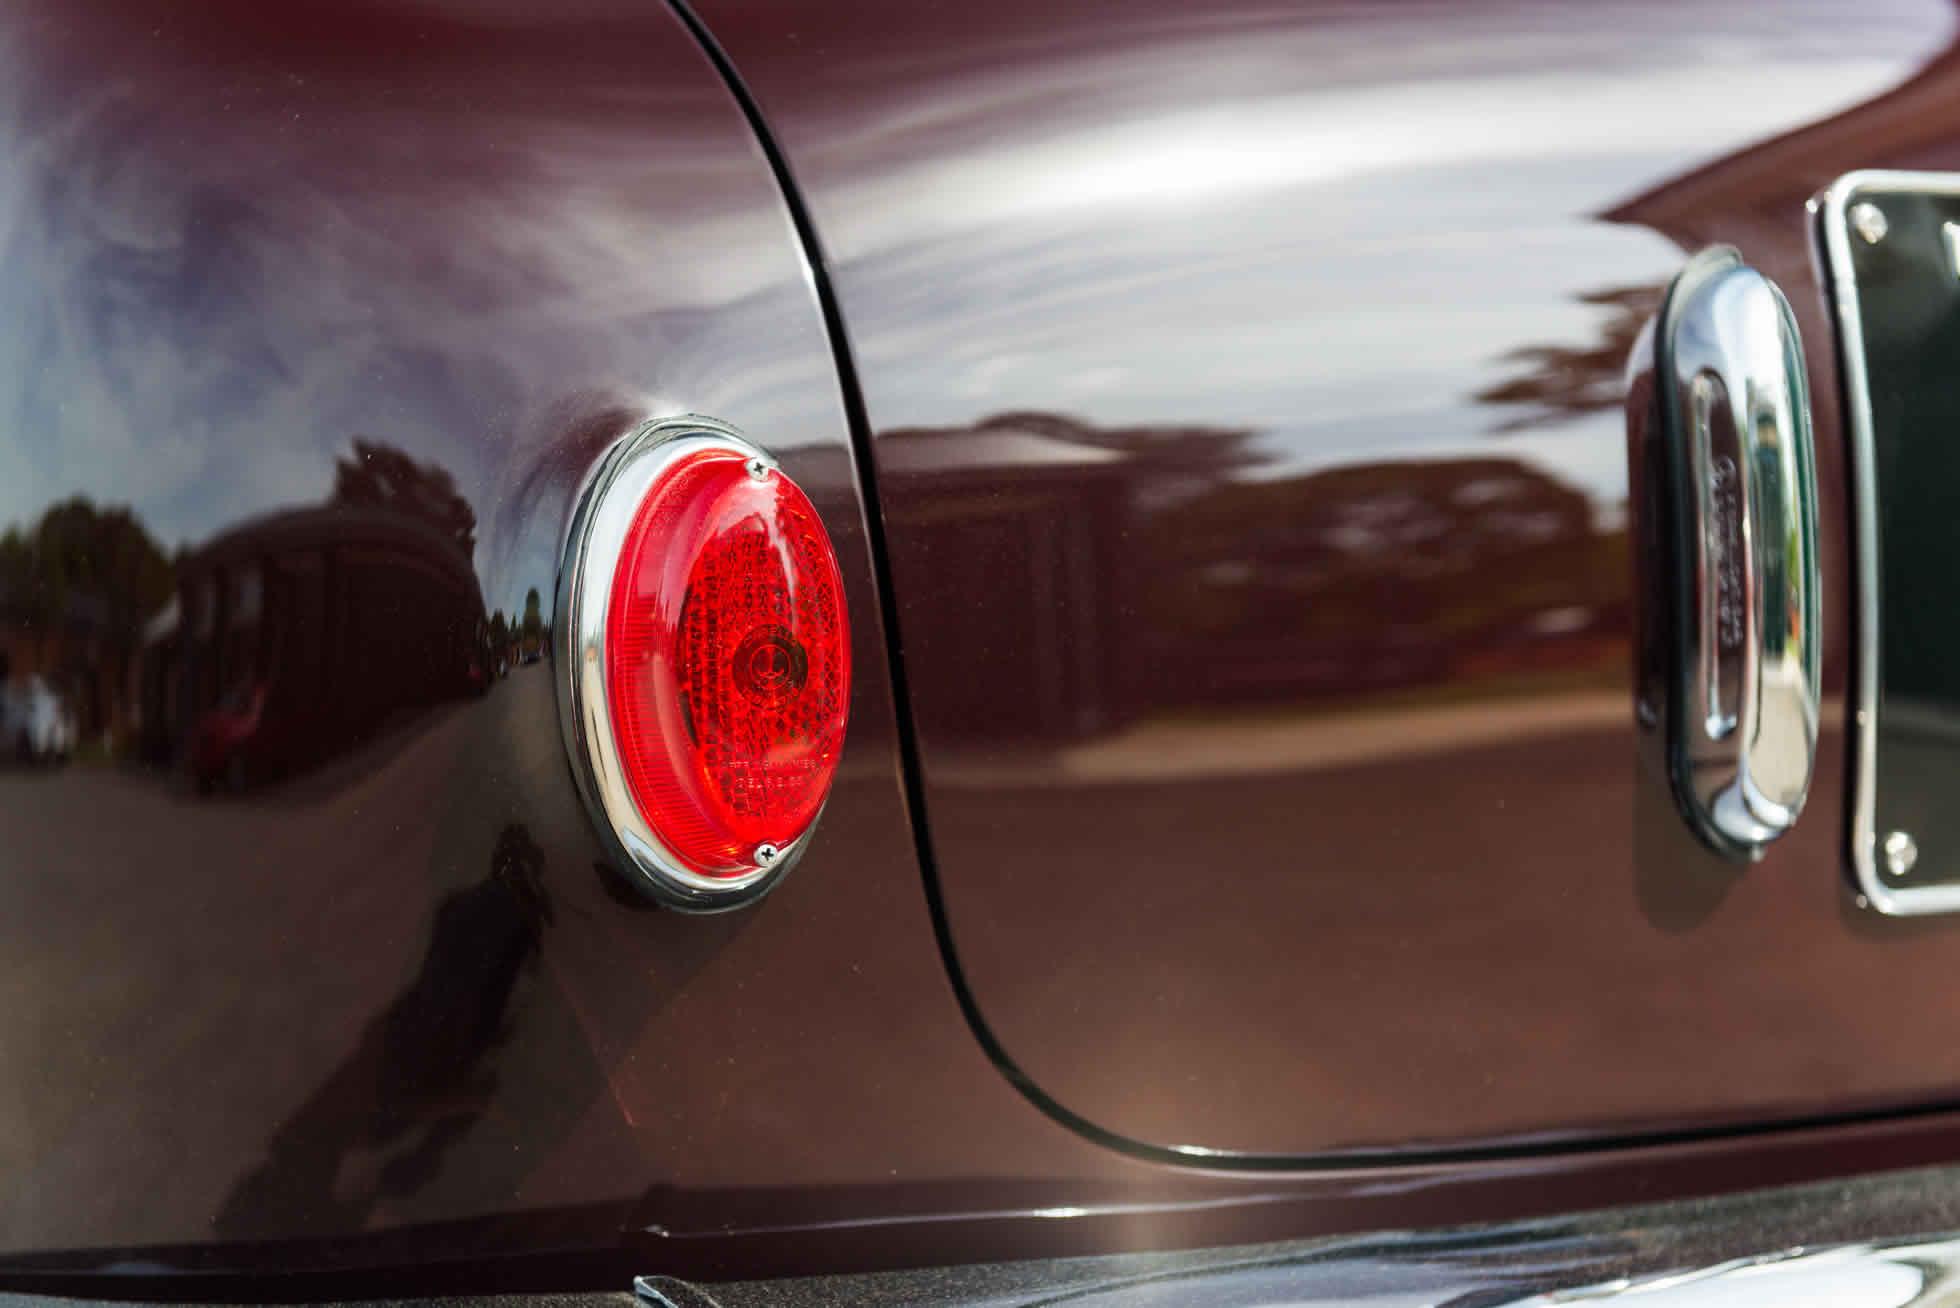 For Sale 1953 Lancia Aurelia B20GT Series III Coupe rear light